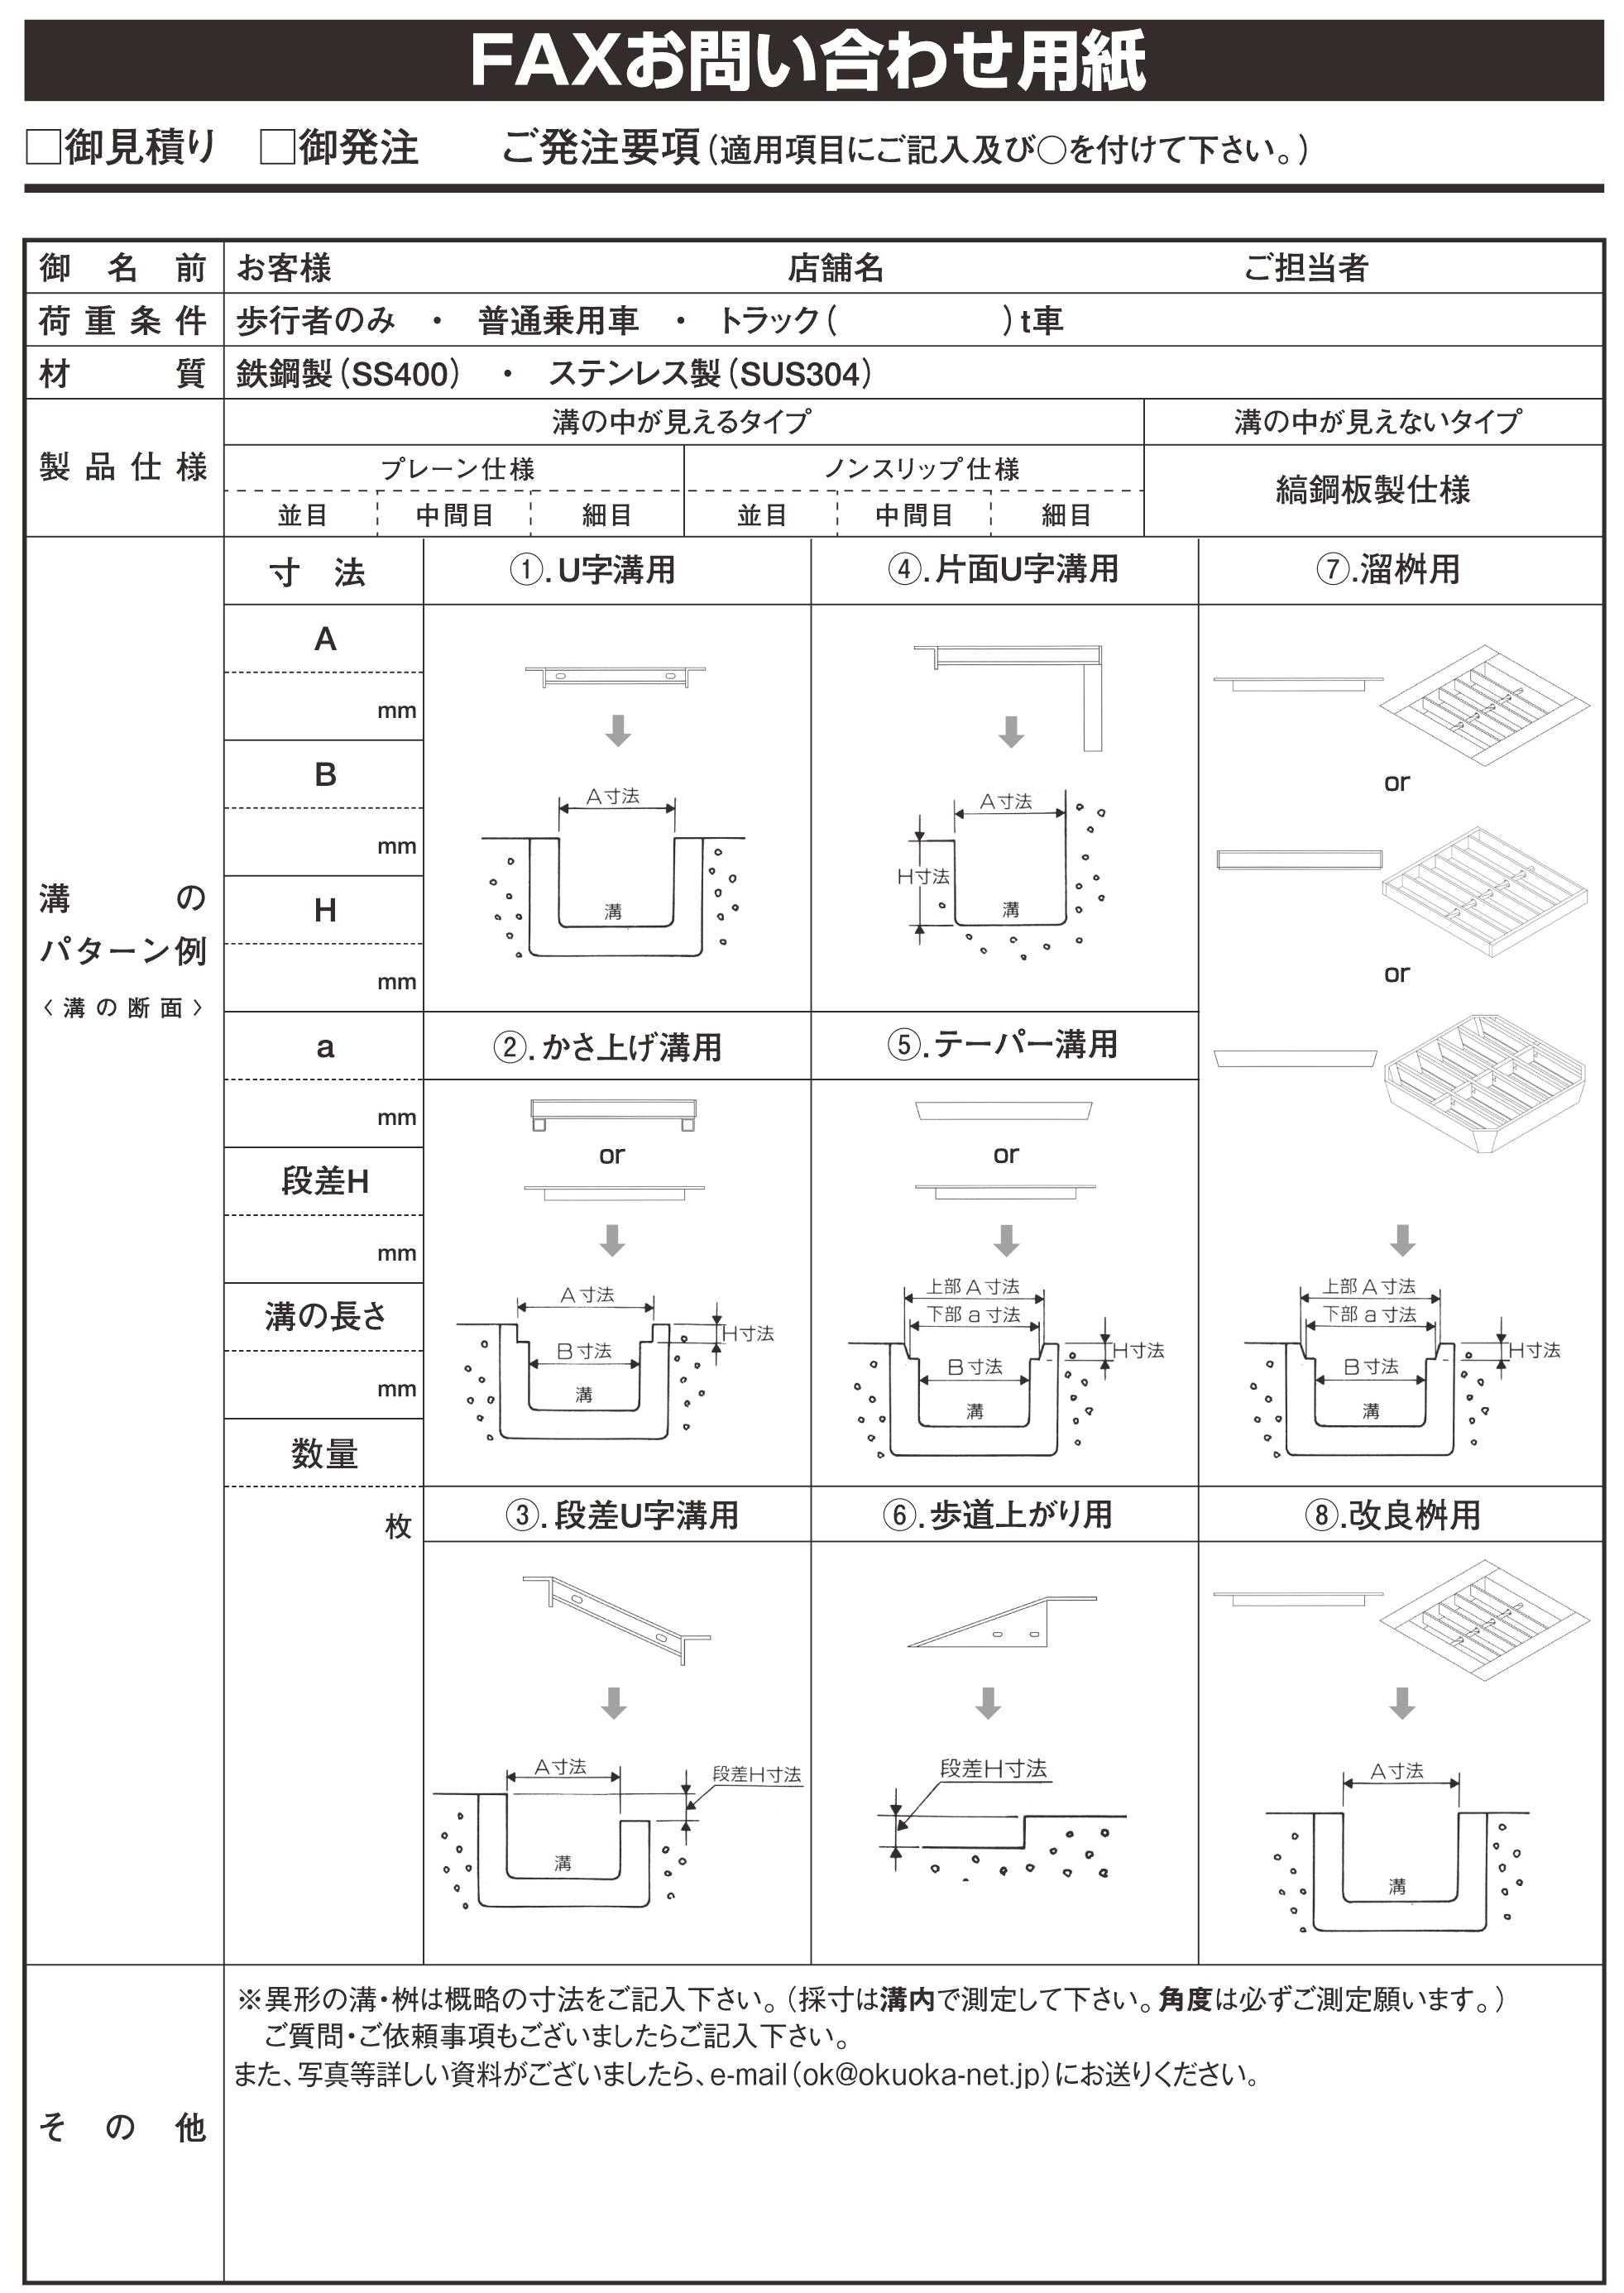 特注品お問合せ用紙【奥岡製作所】